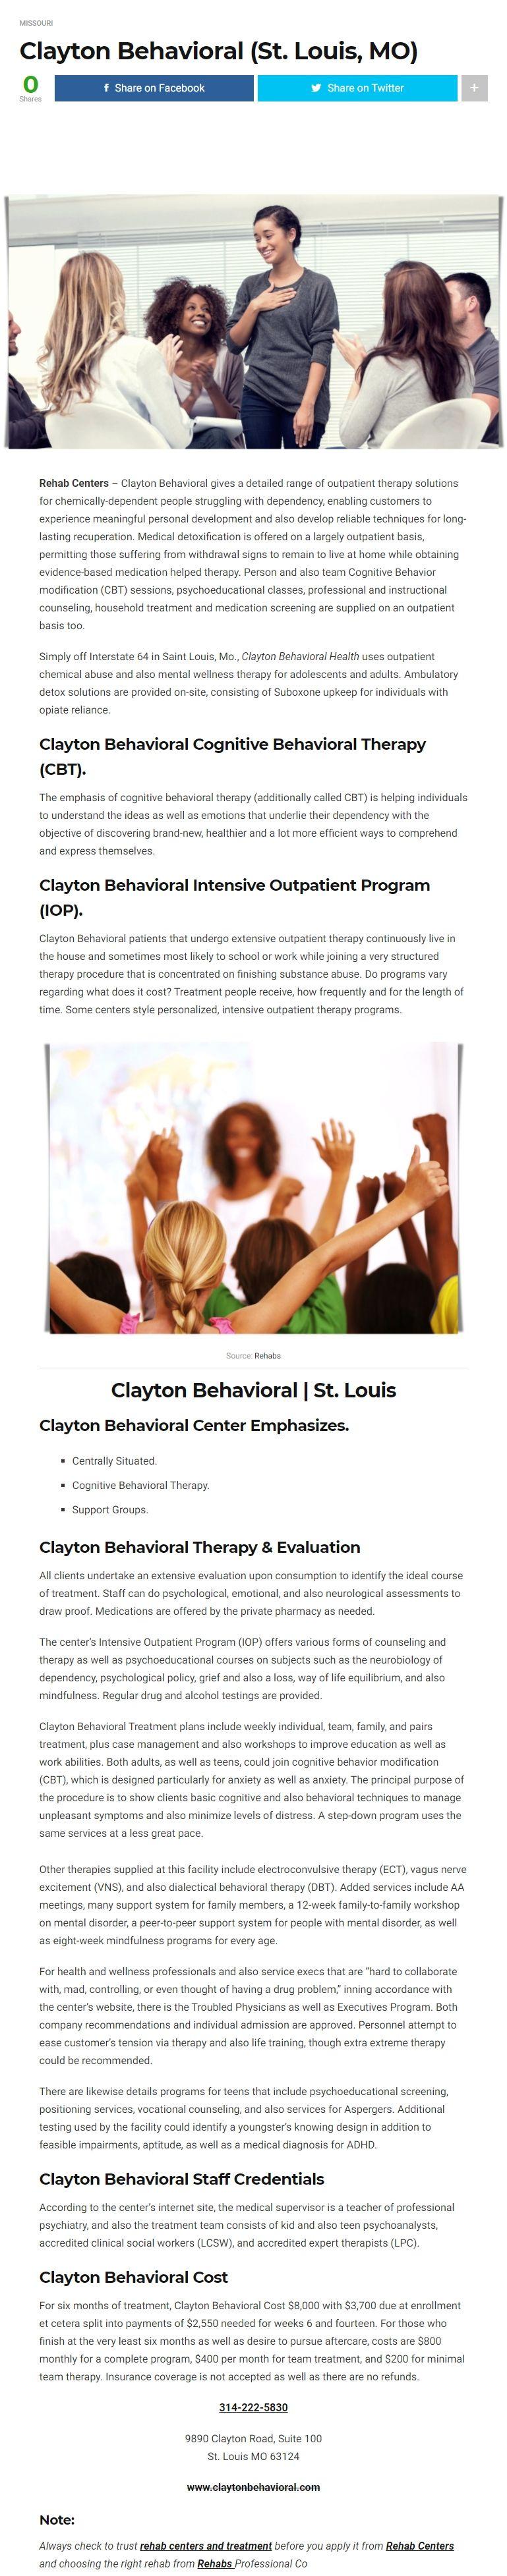 Clayton behavioral gives a detailed range of outpatient